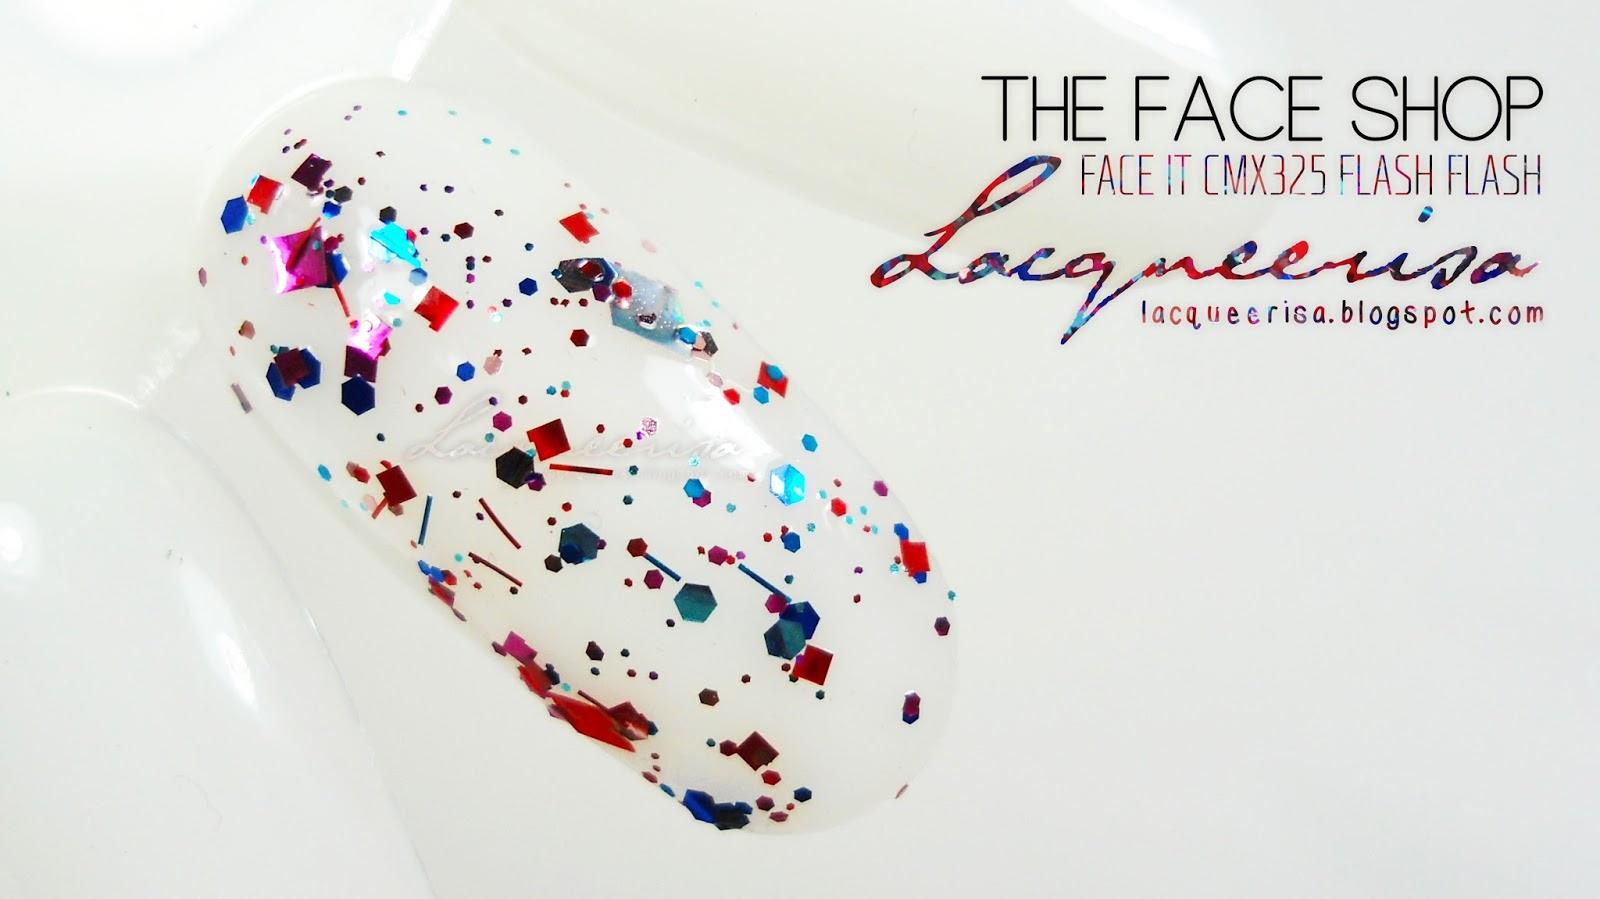 Lacqueerisa: The Face Shop CMX325 Flash Flash